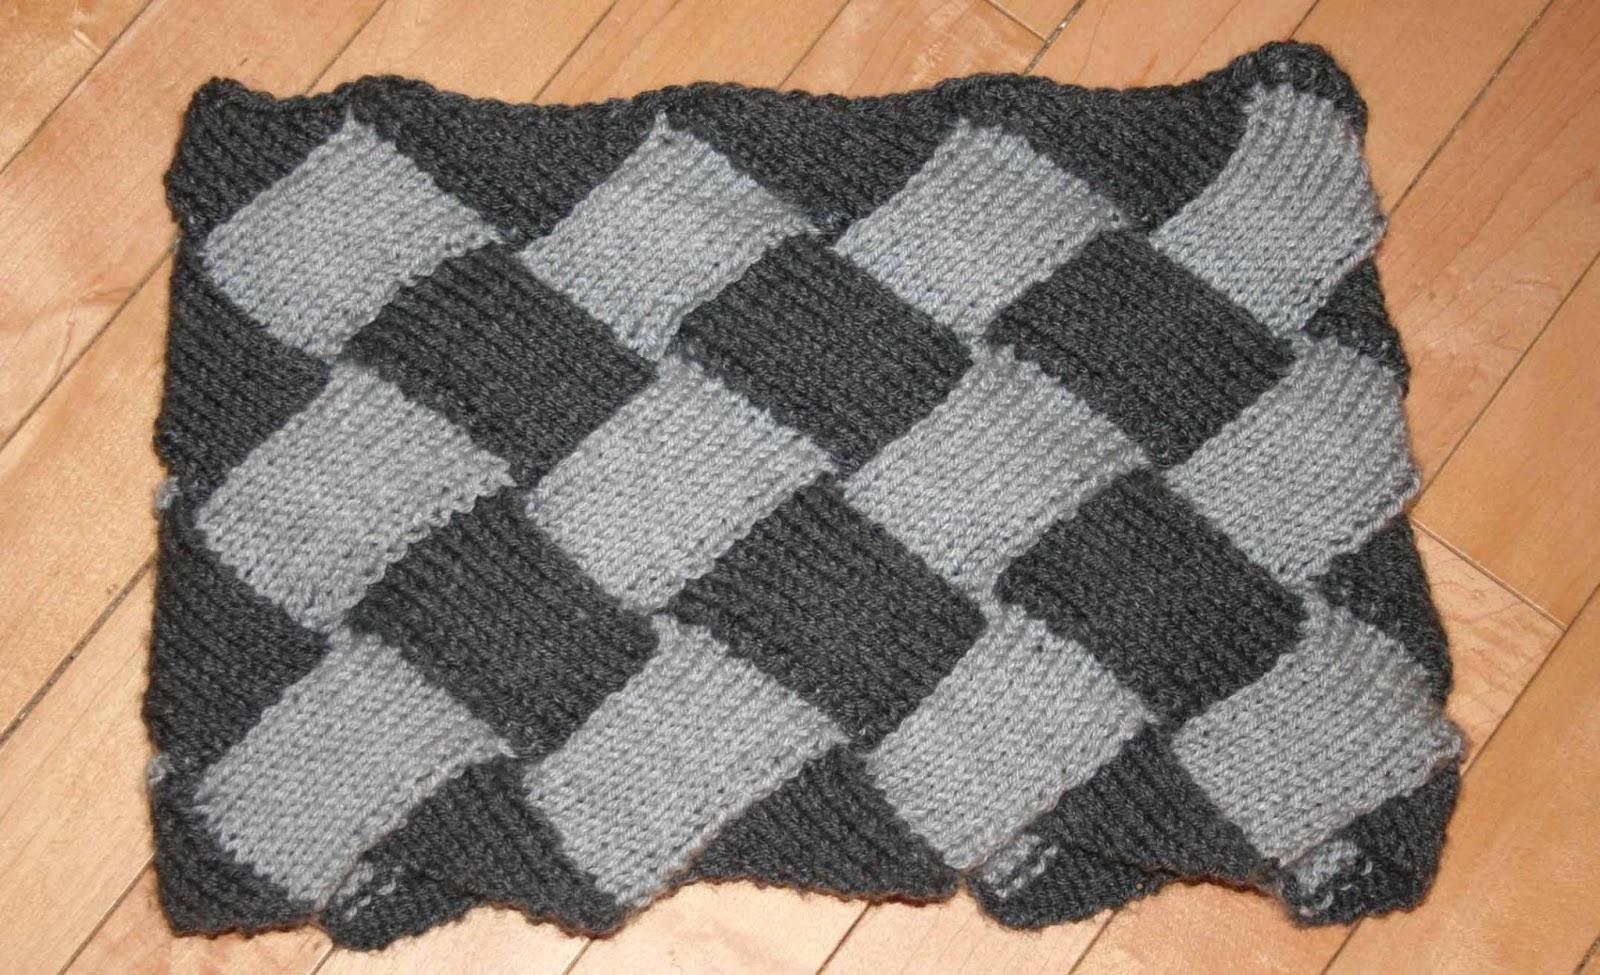 Entrelac Cowl Knitting Pattern : stvital: Entrelac Shawl/Cowl